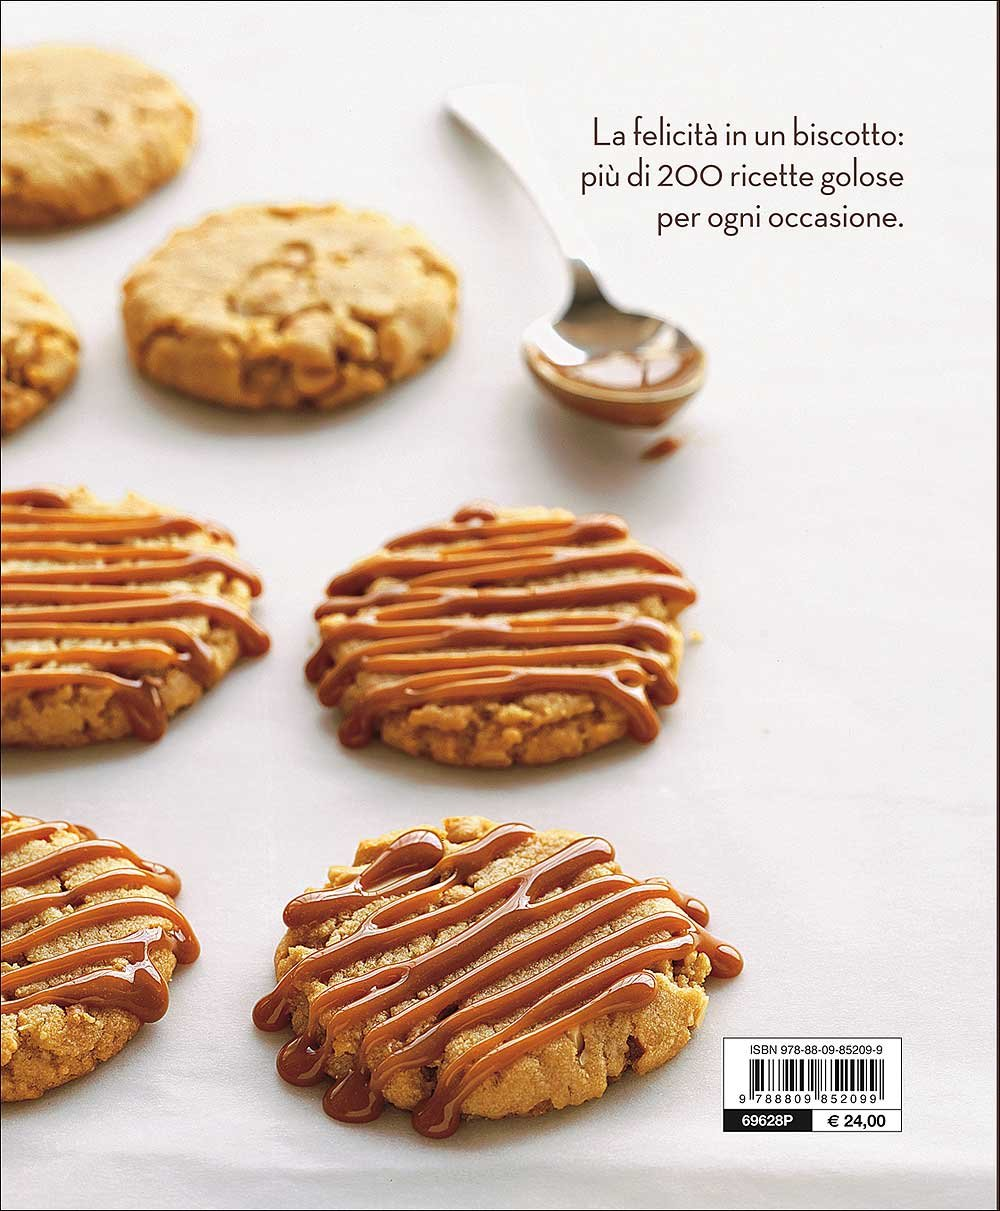 71ttxKsnMmL - Biscotti. Tutte le ricette di cookies, cupcakes, shortbread, brownies...